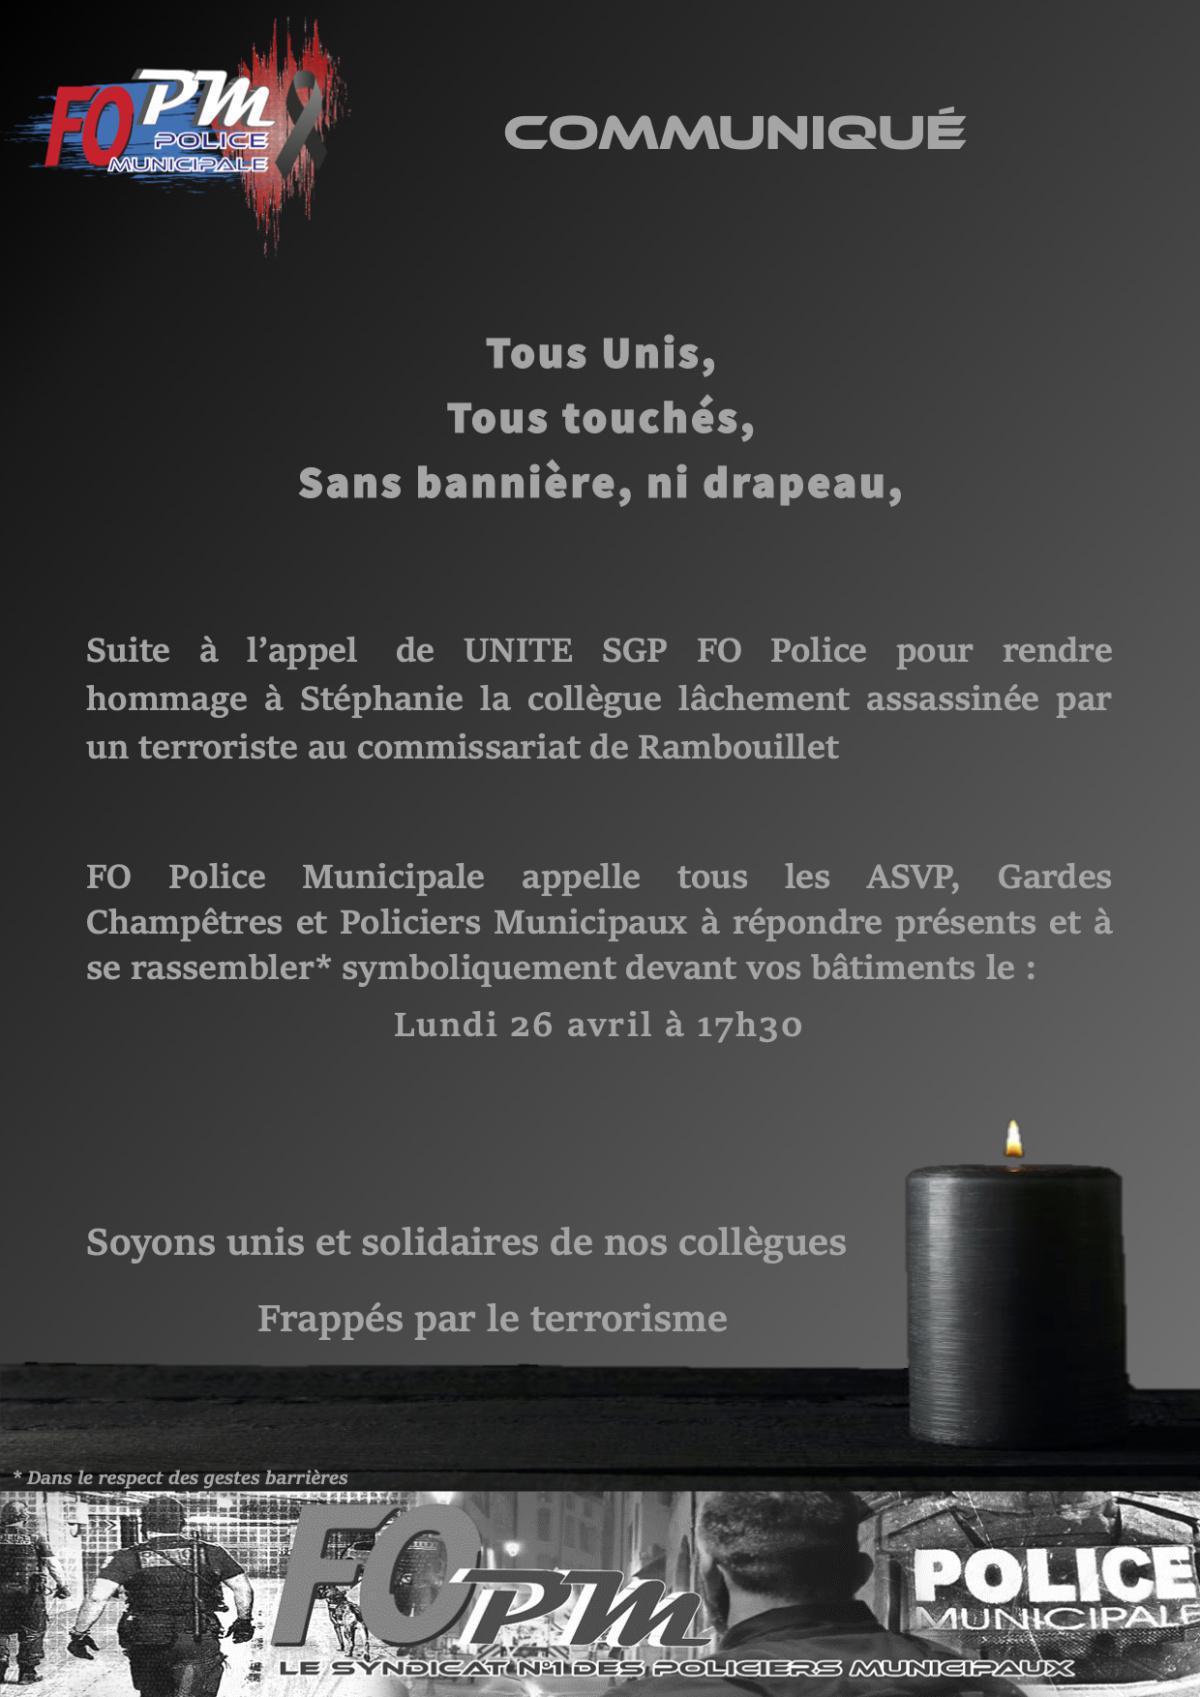 Attentat au commissariat de Rambouillet